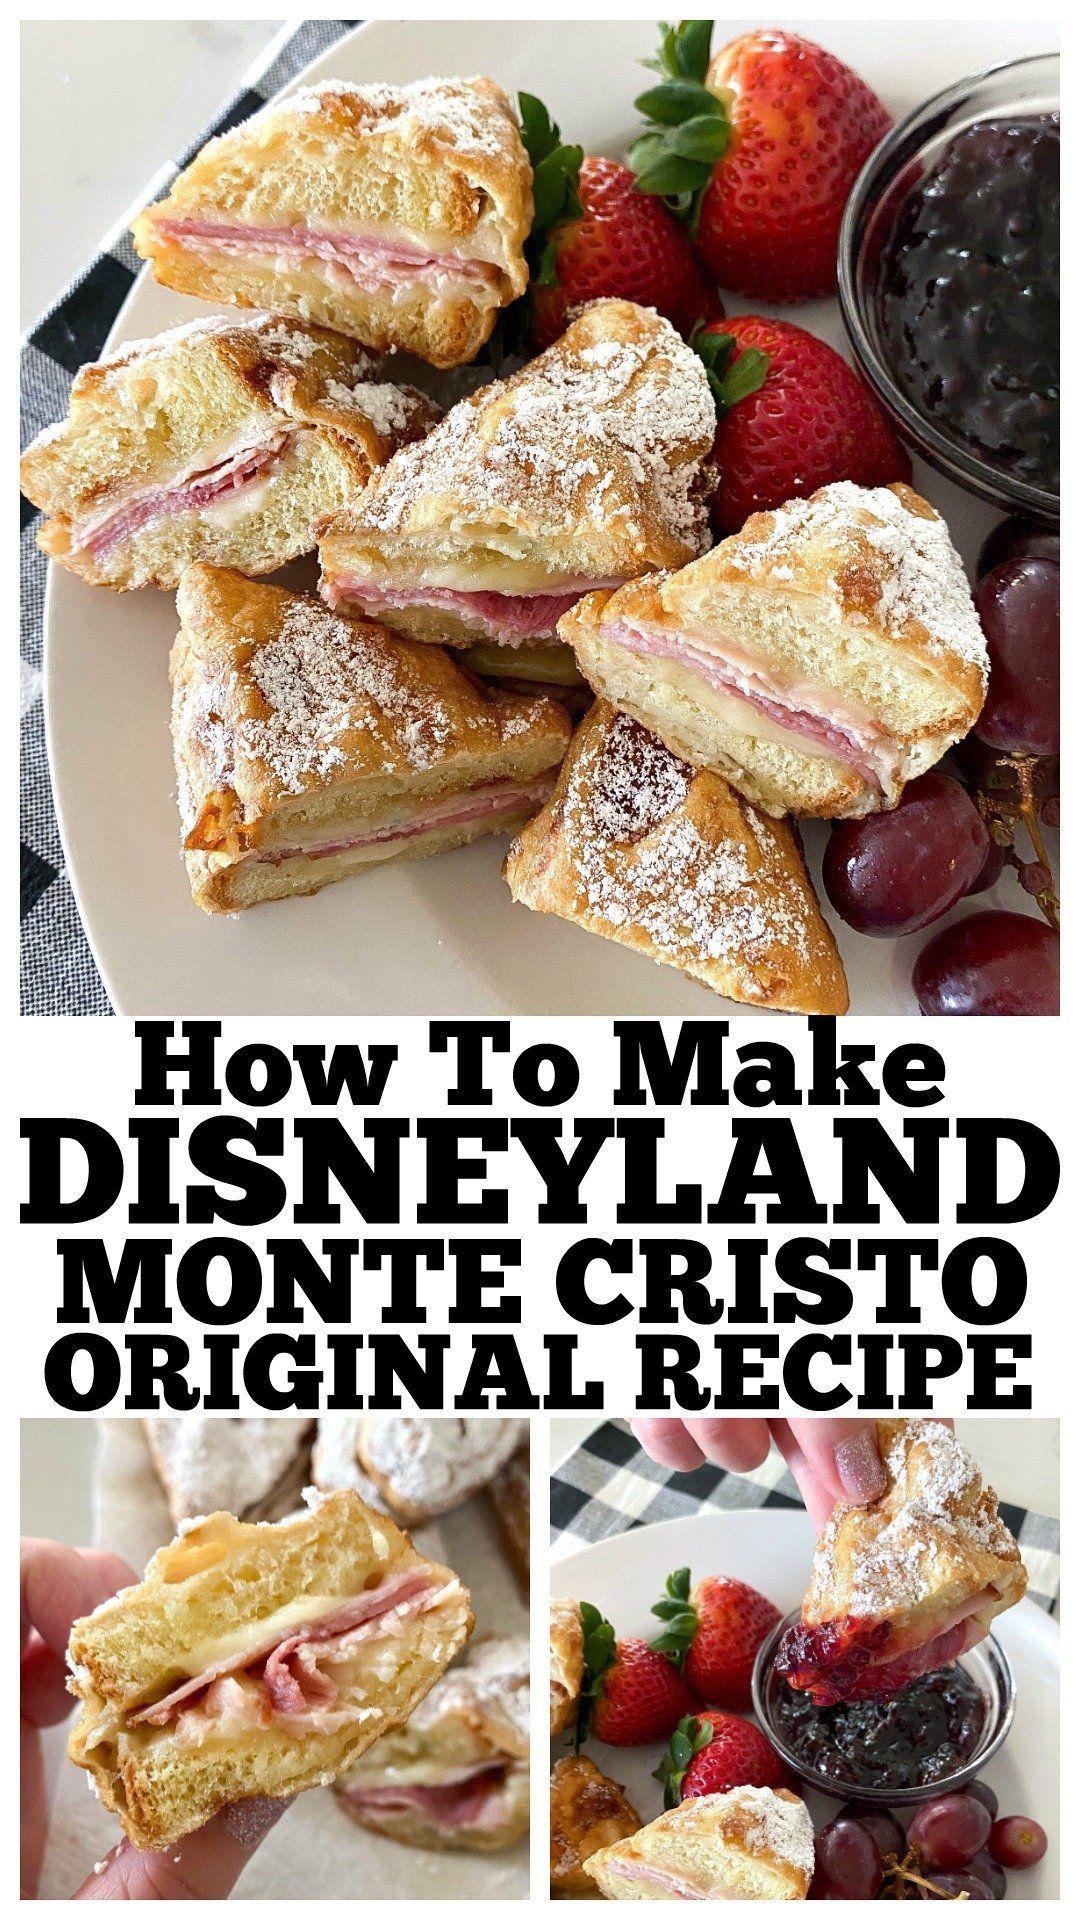 Monte Cristo Original Disneyland In 2020 Monte Cristo Sandwich Recipes Monte Cristo Sandwich Recipe